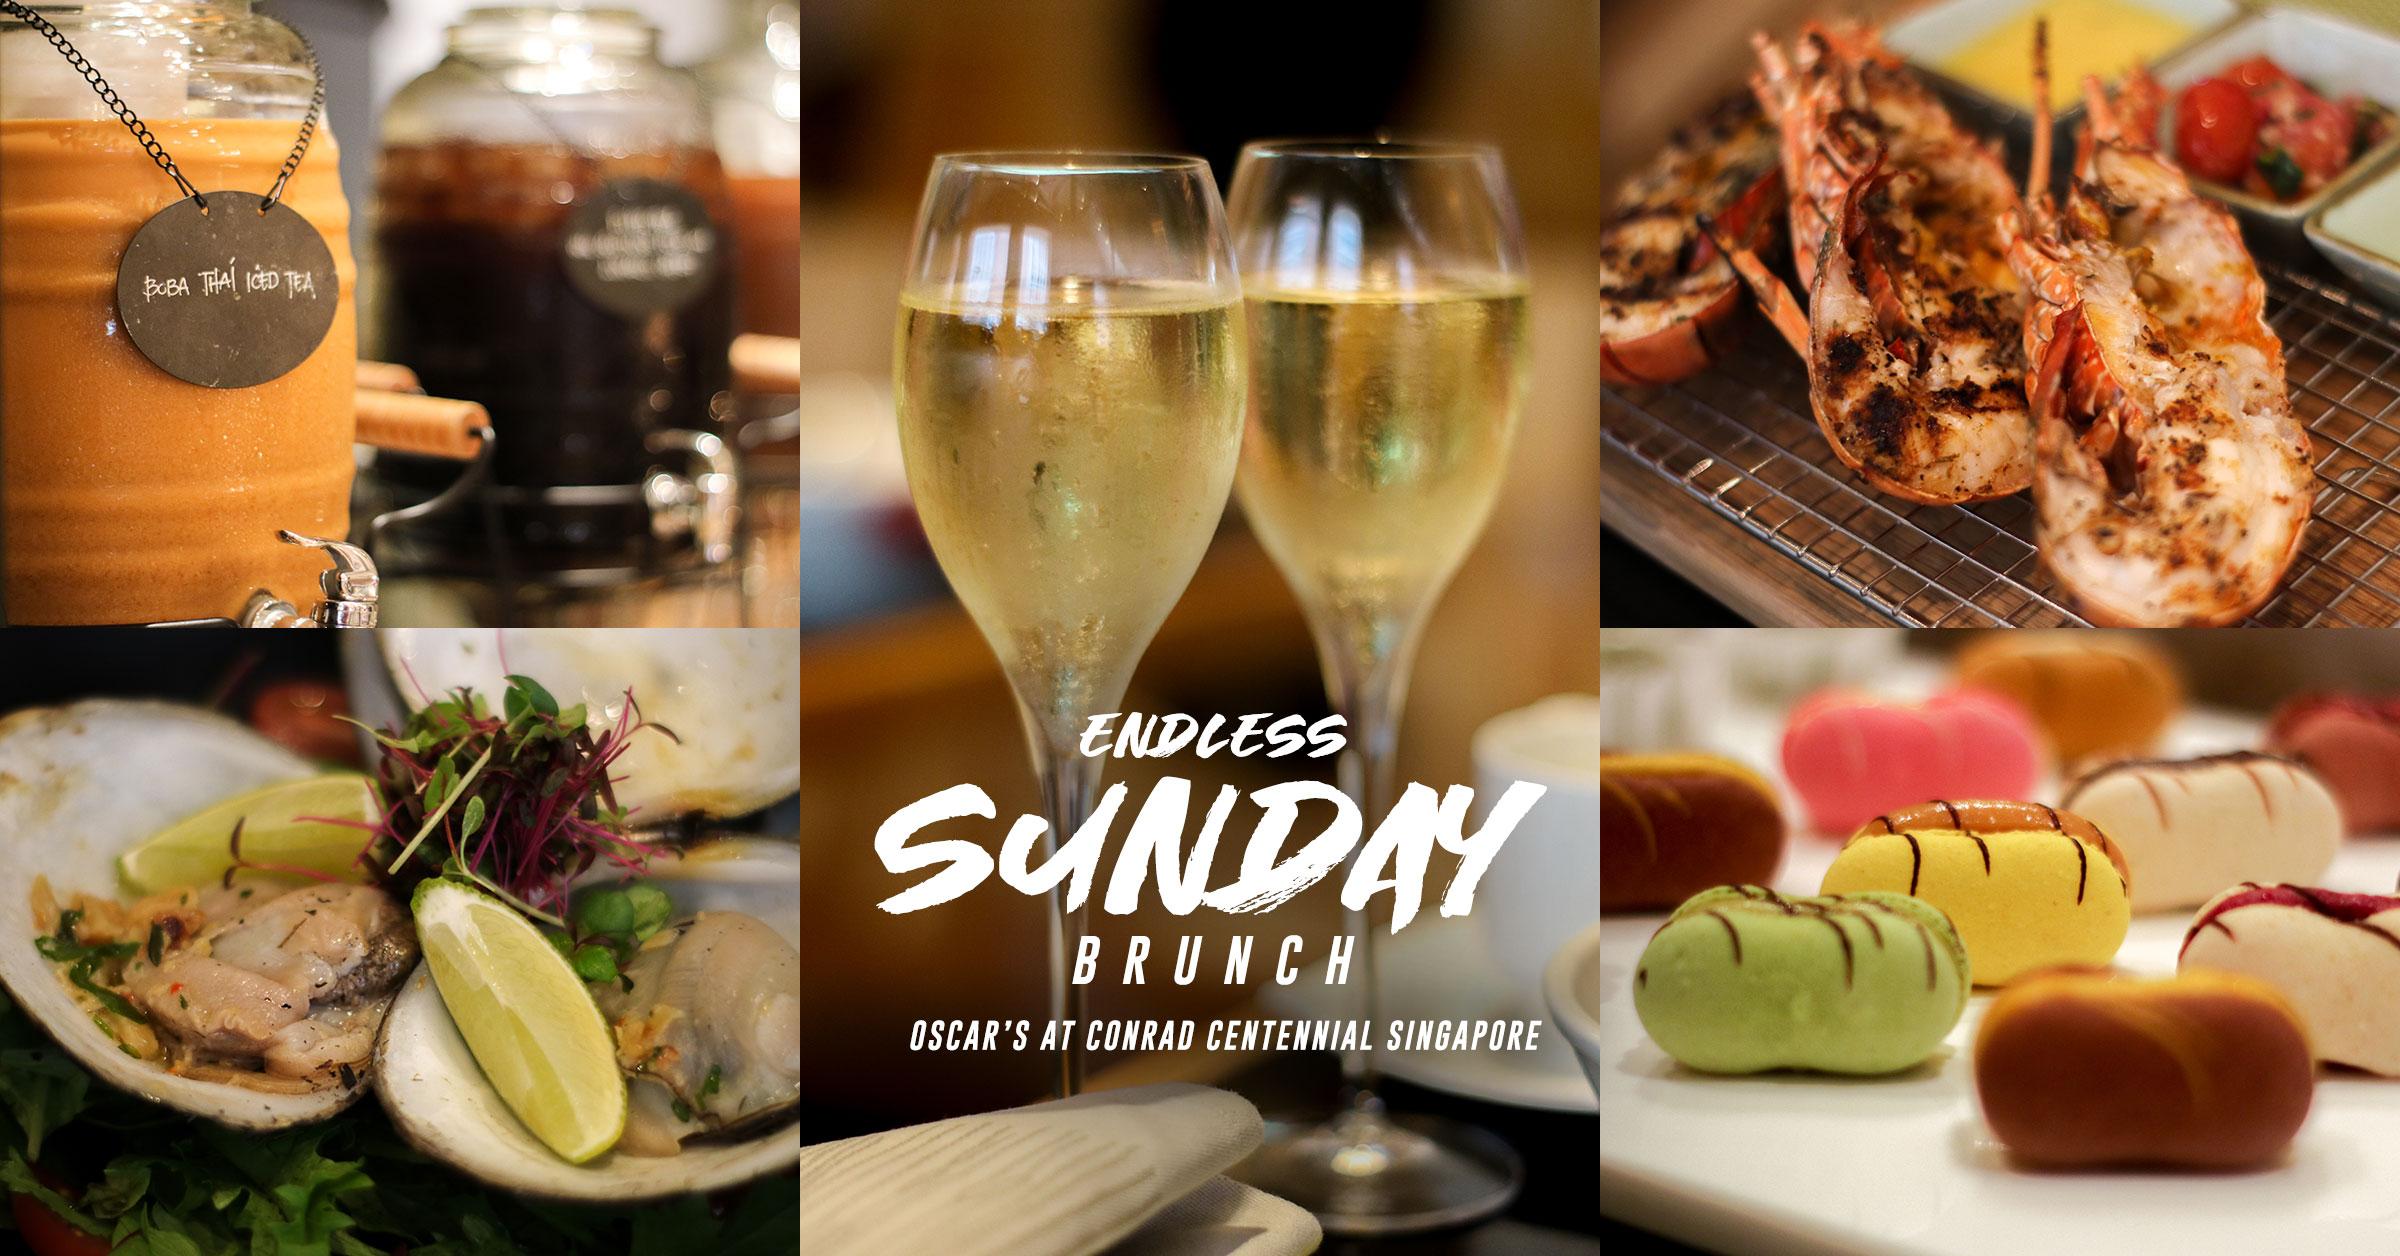 Conrad-Sunday-Endless-Brunch-2020-darrenbloggie